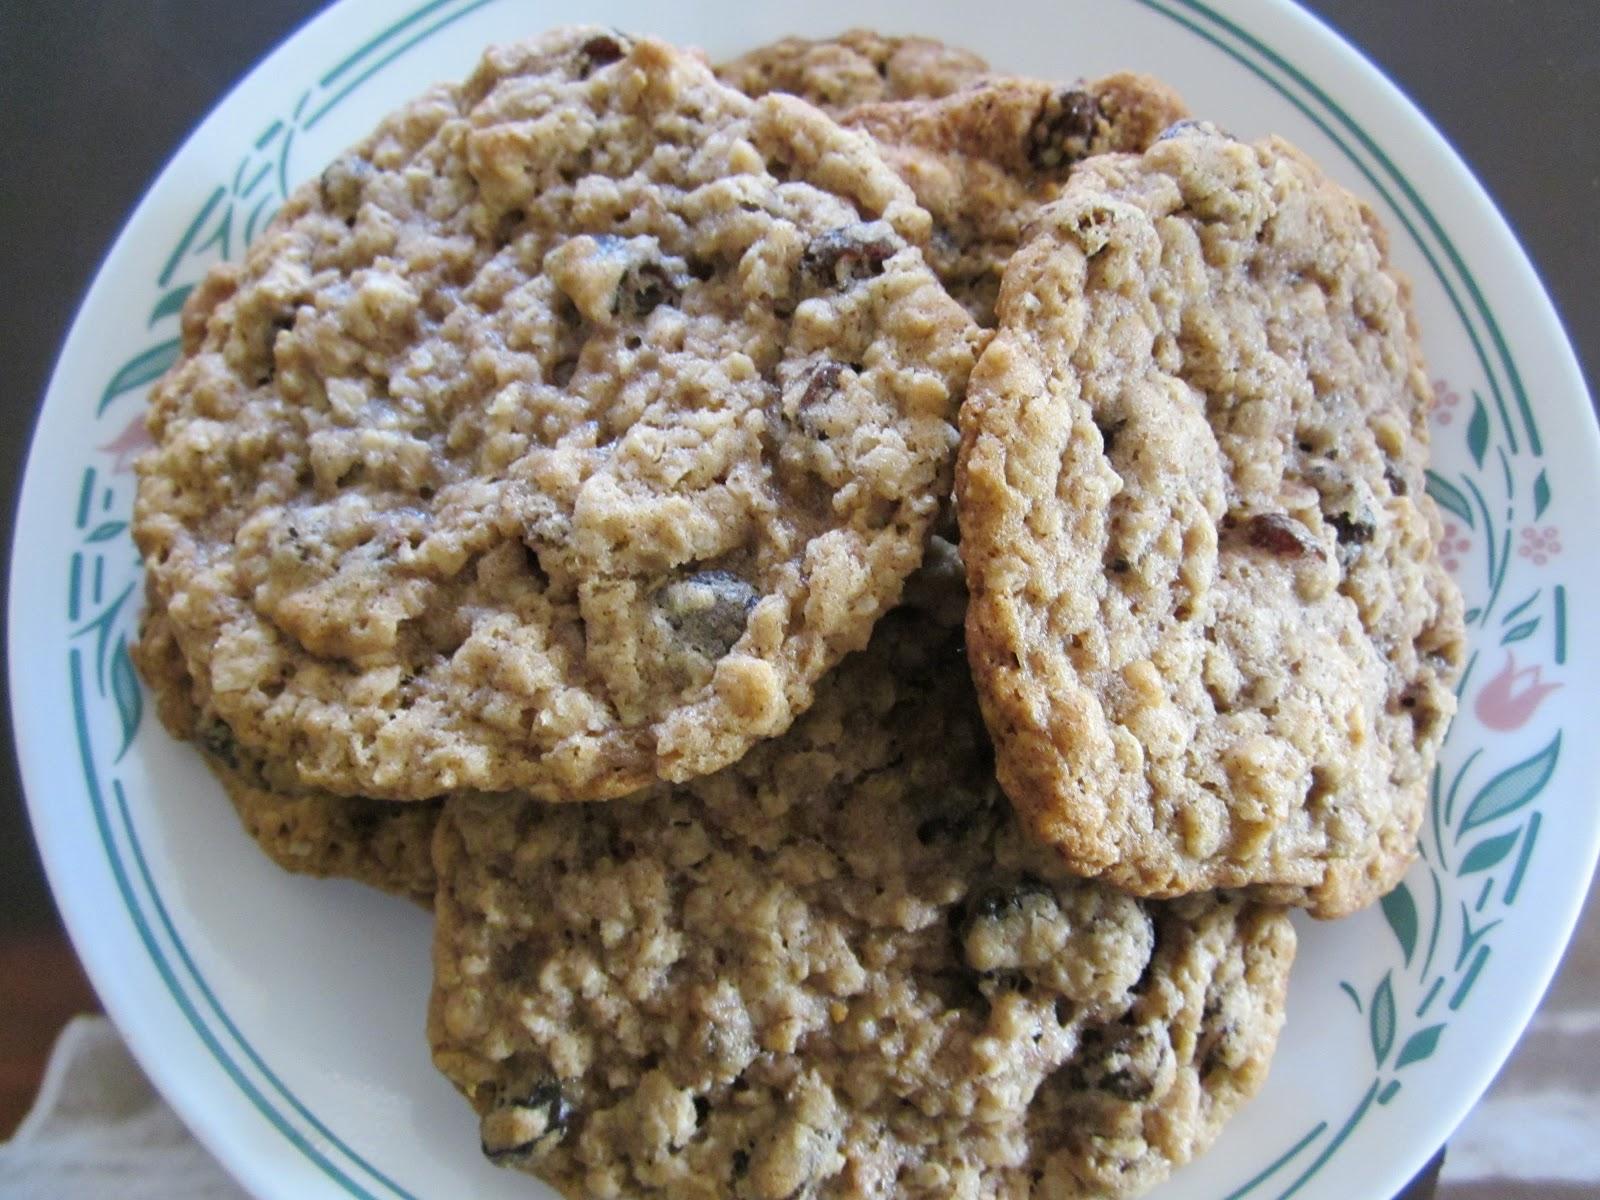 37 Cooks: Oatmeal Raisin Cookies